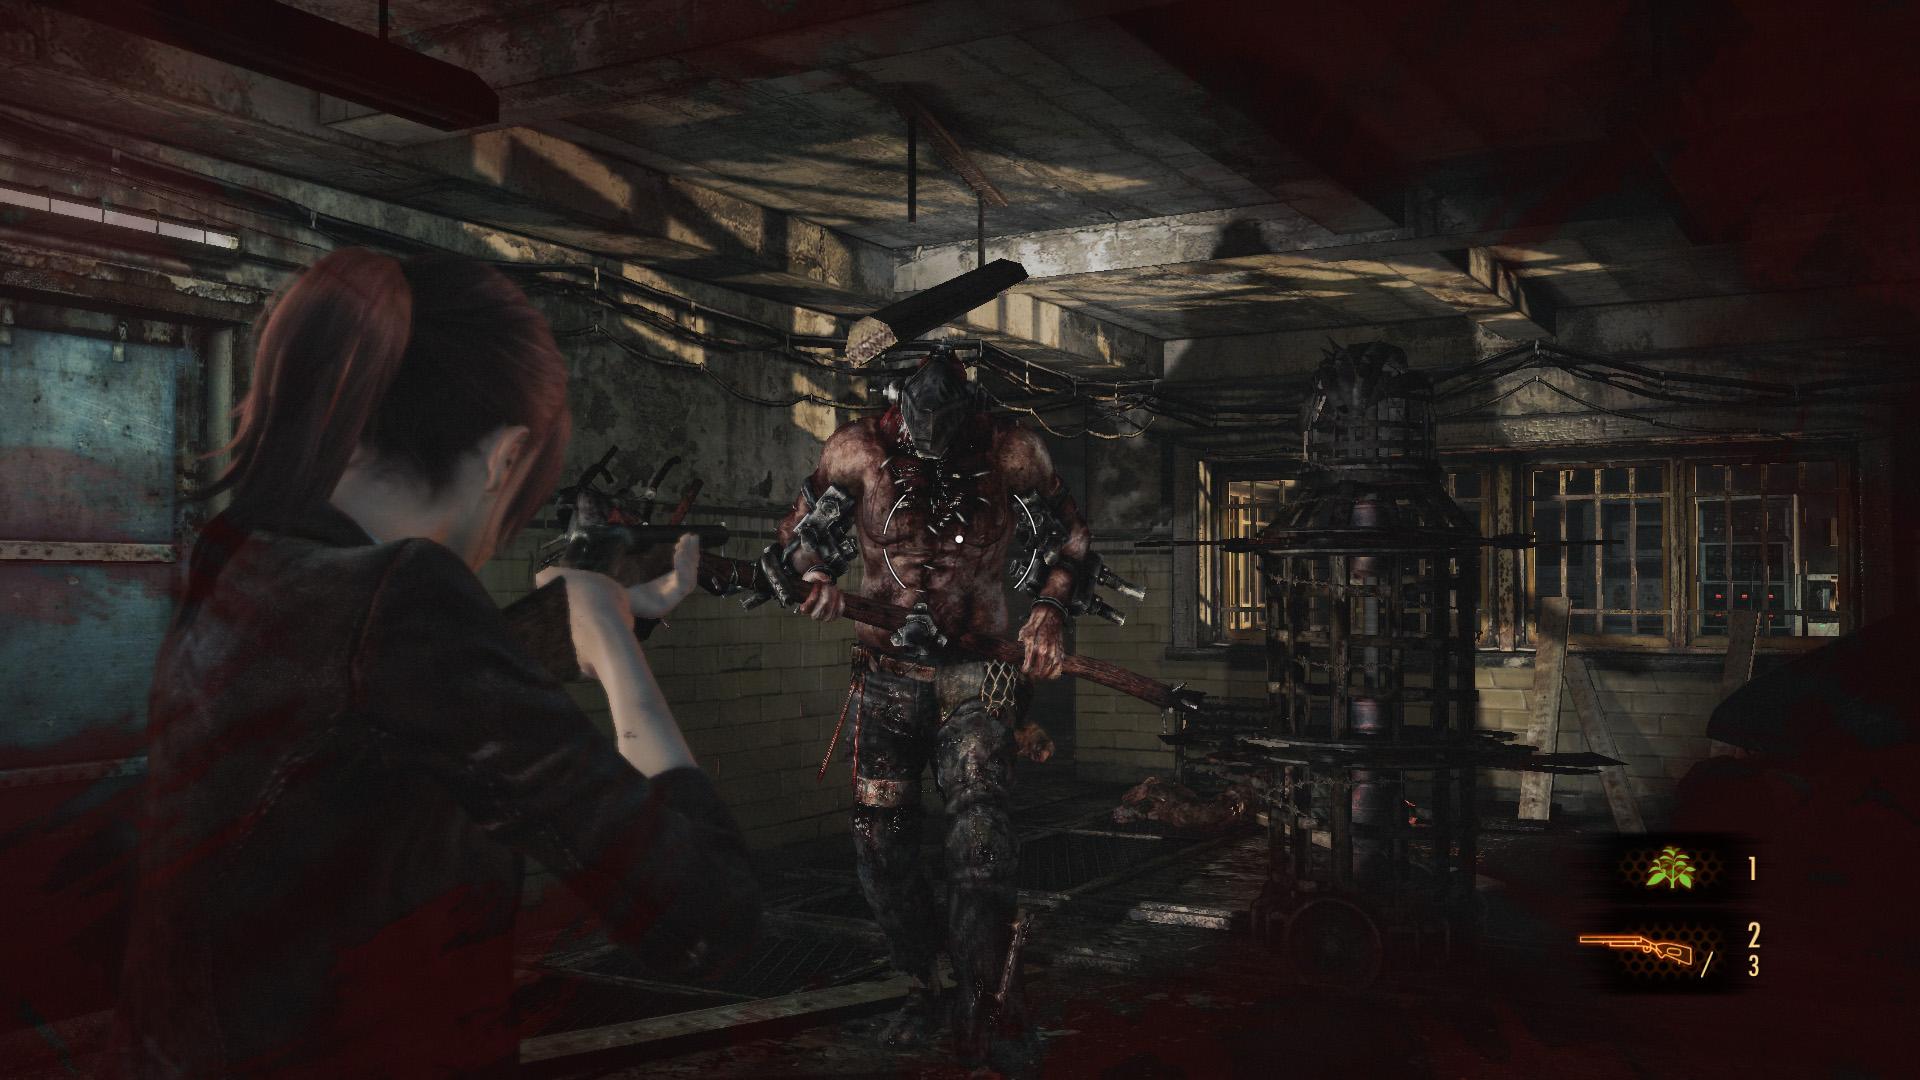 Resident Evil: Revelations 2 (RUS|ENG) [RePack] от R.G. Механики